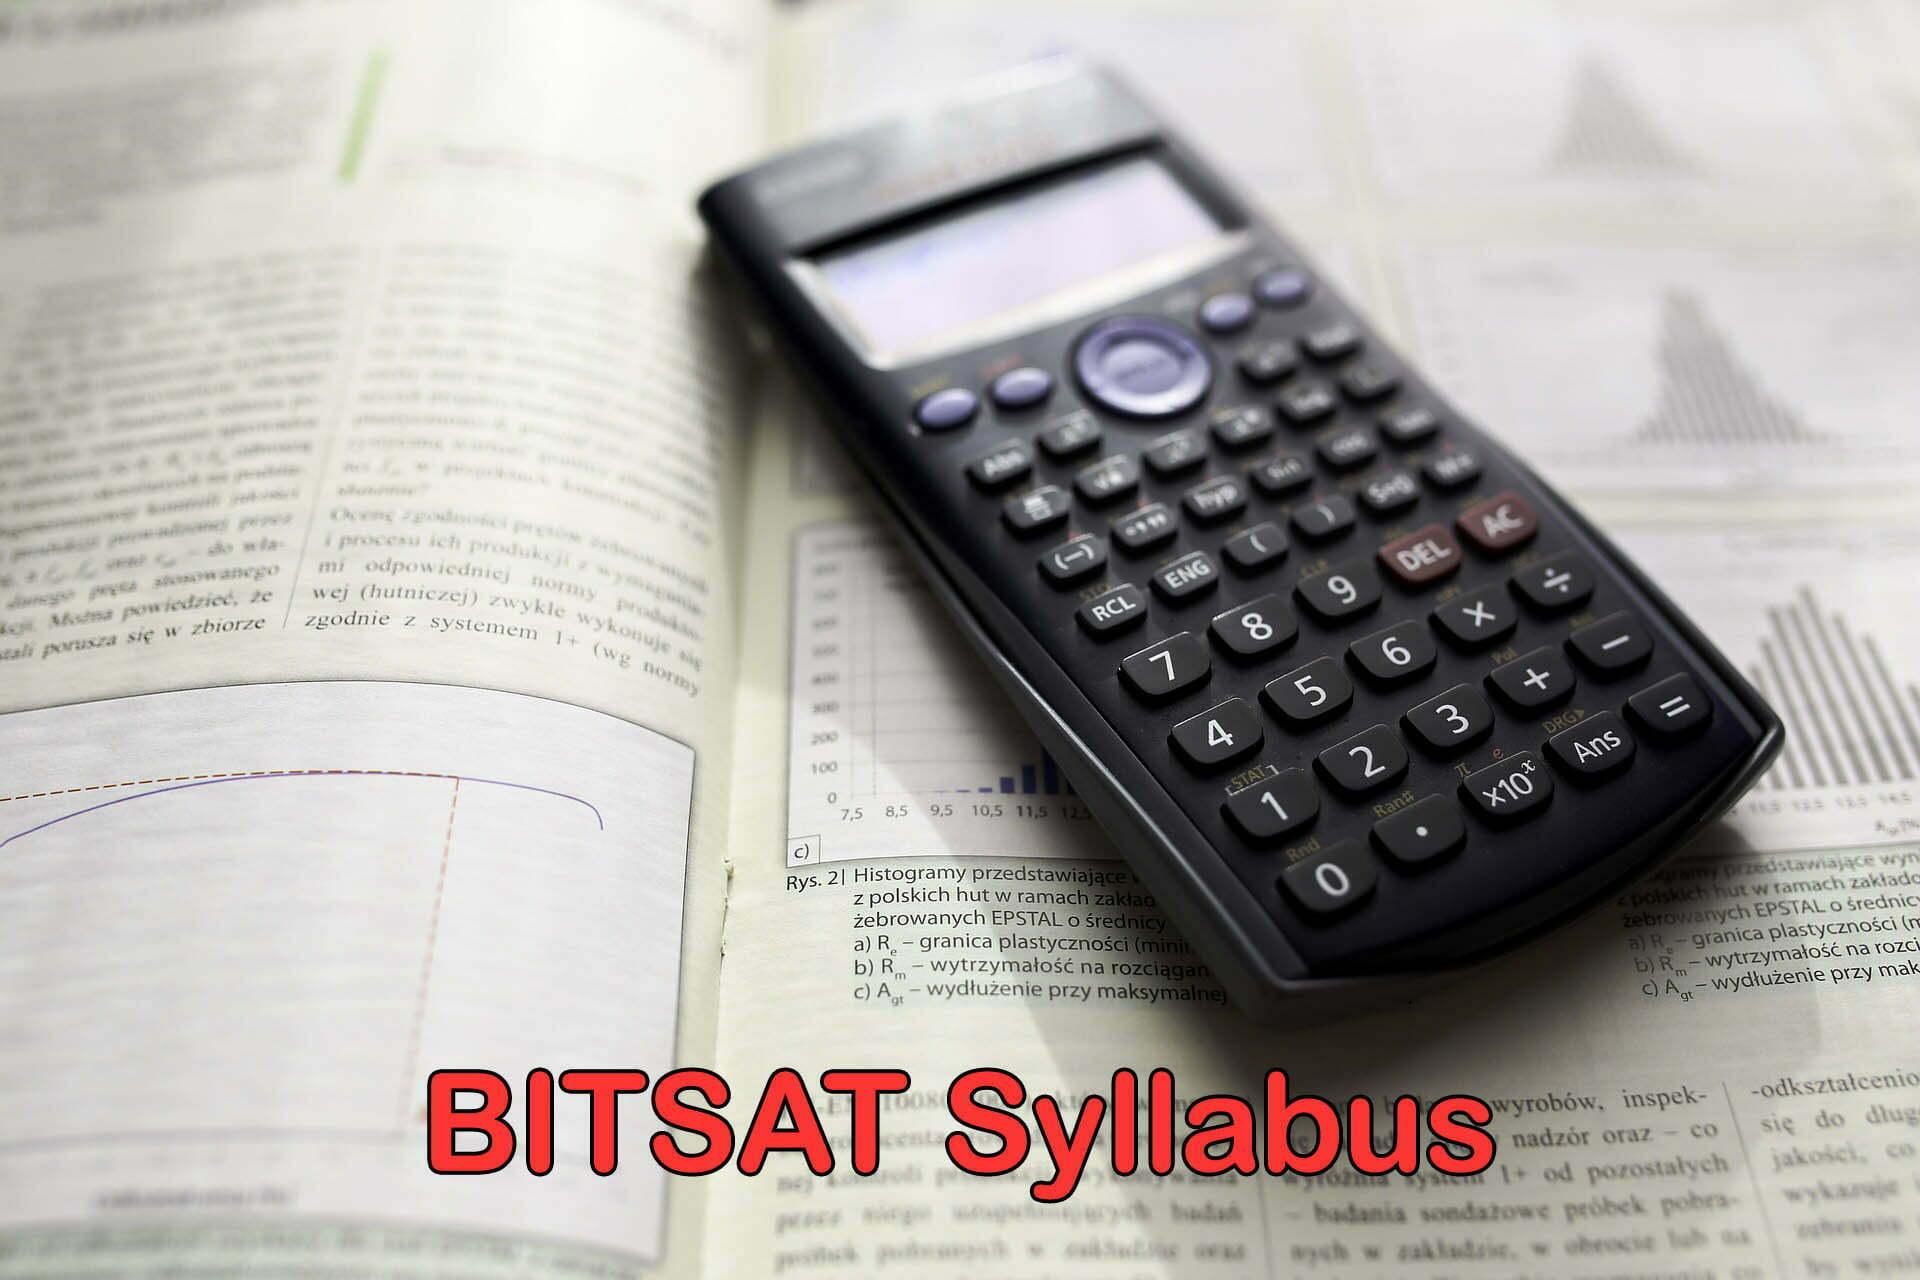 BITSAT Syllabus